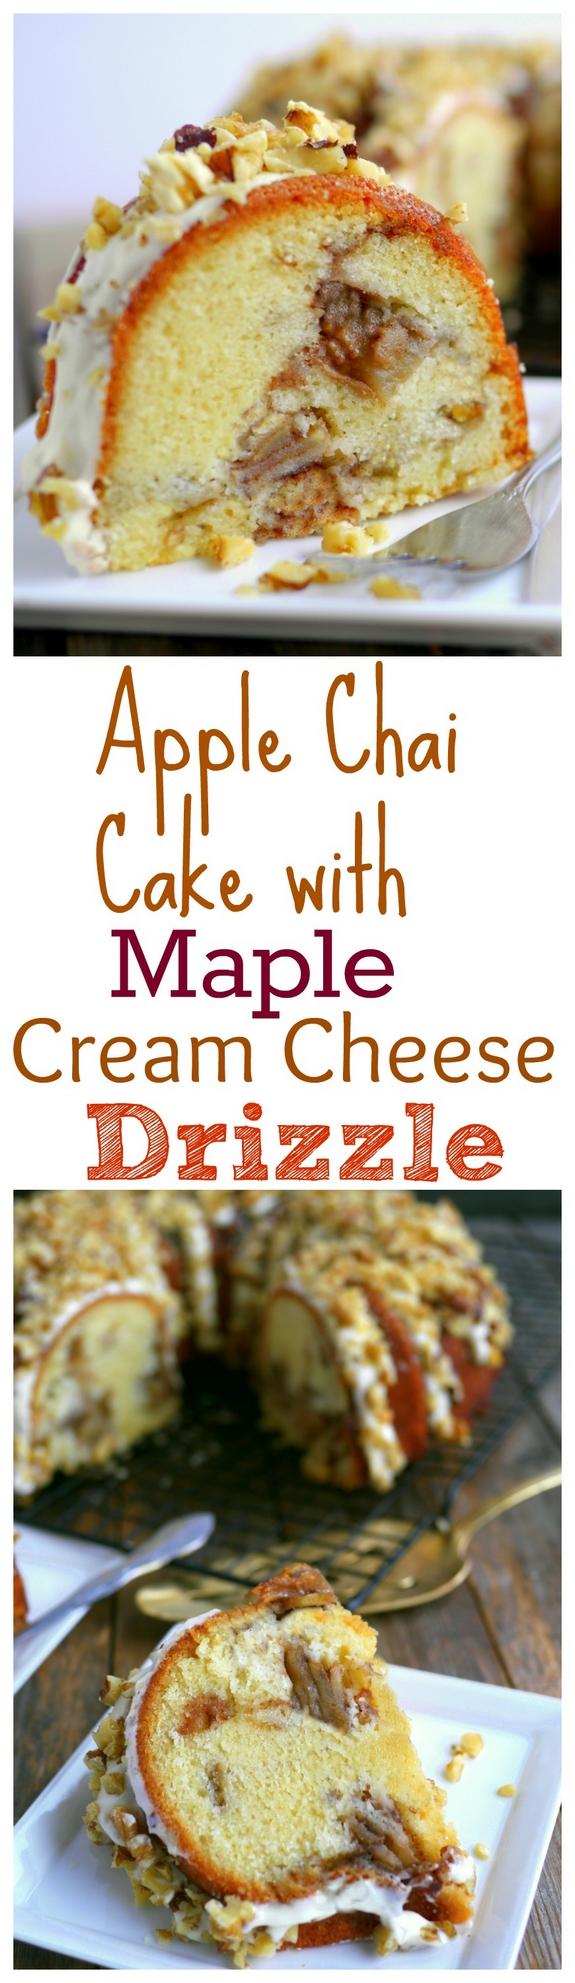 Noble Apple Cake